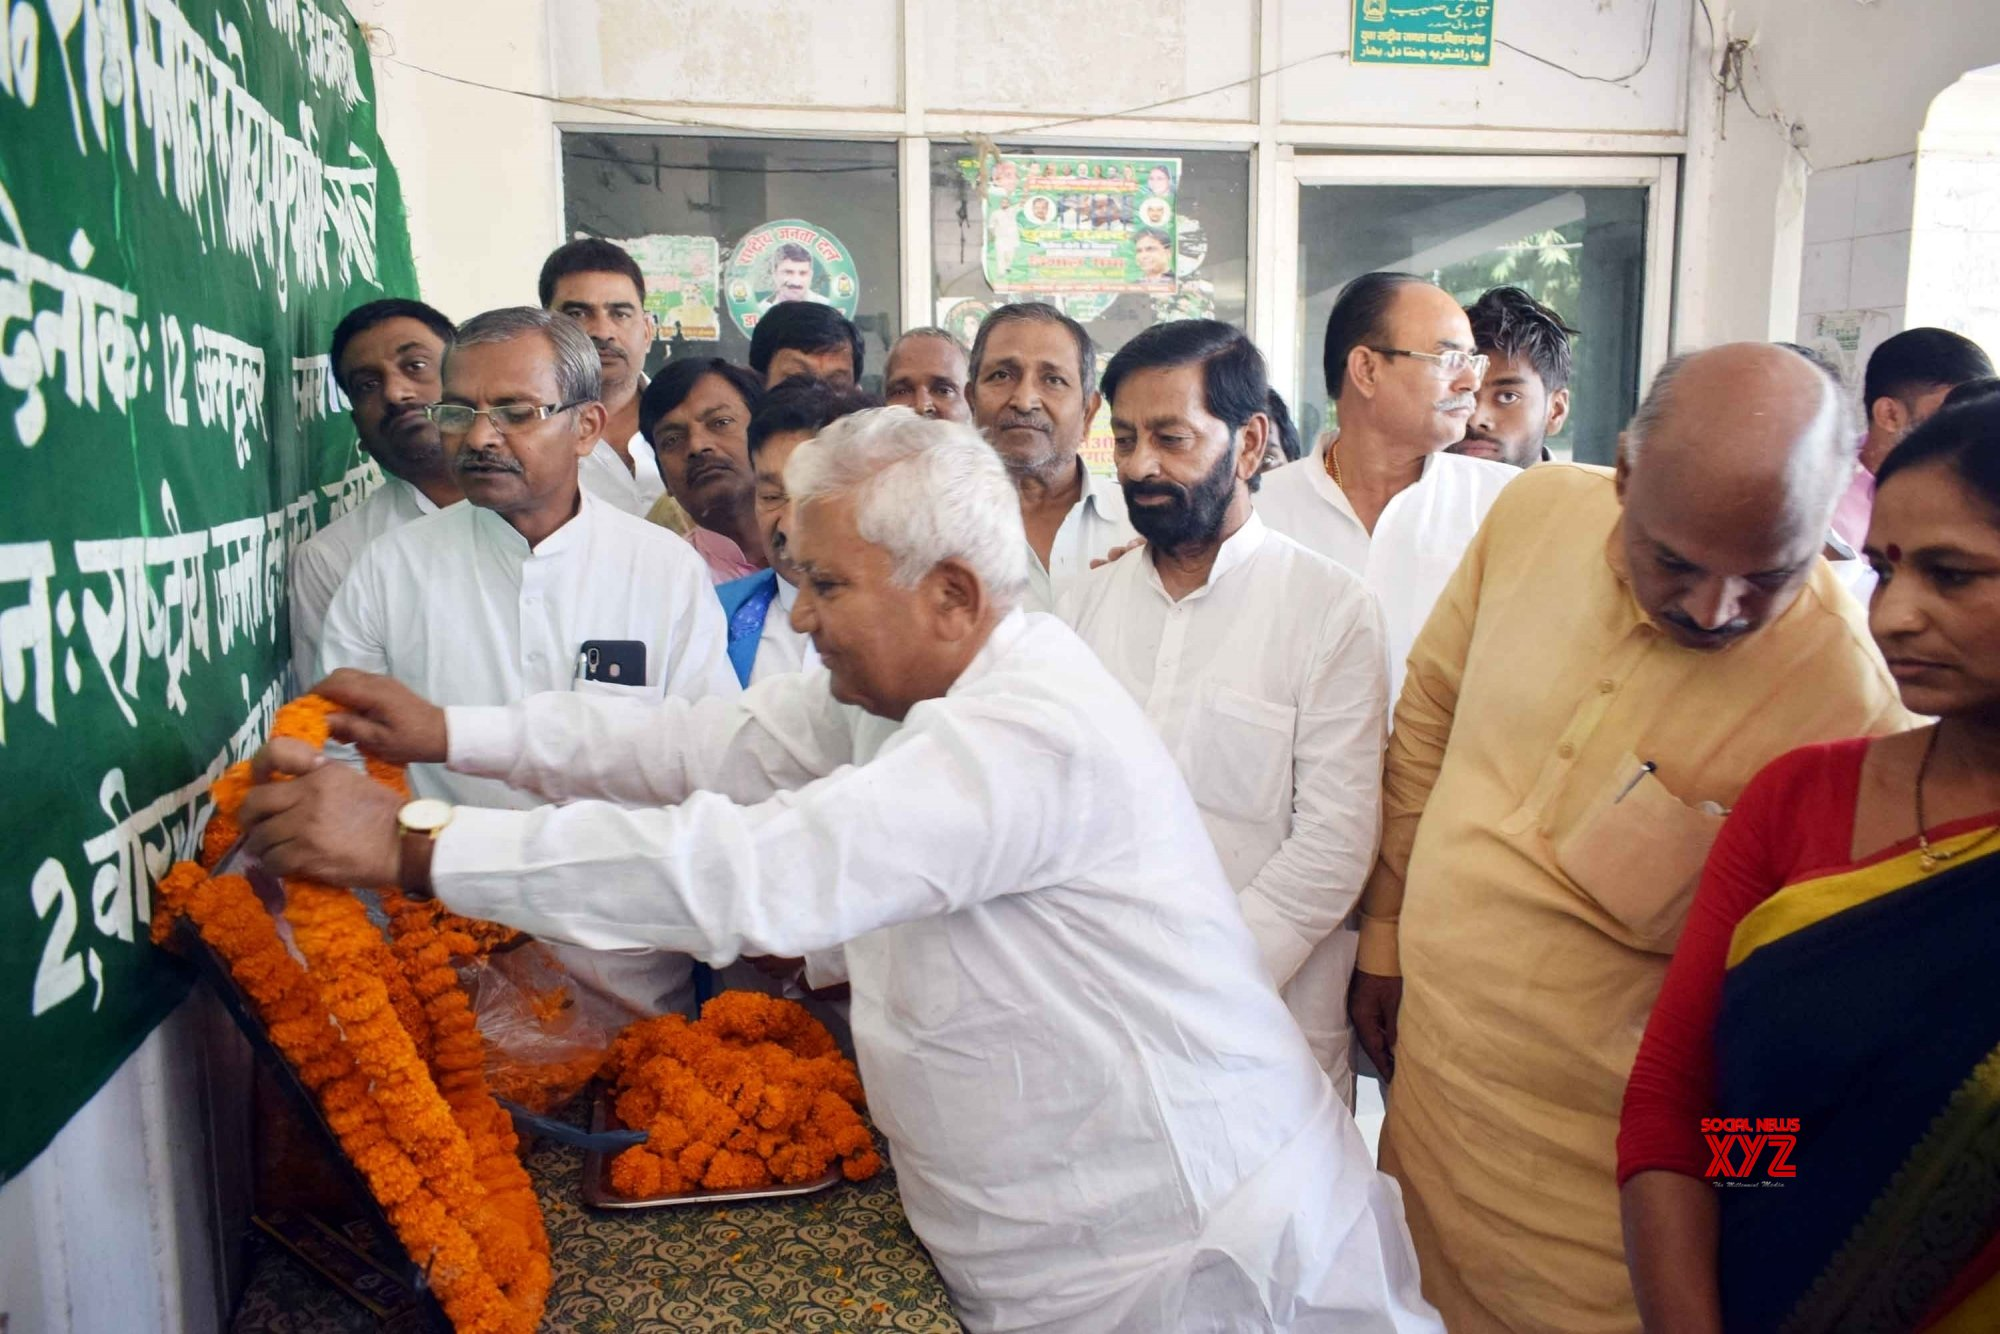 Patna: Ram Manohar Lohia's death anniversary - Ram Chandra Purbey pays tributes #Gallery